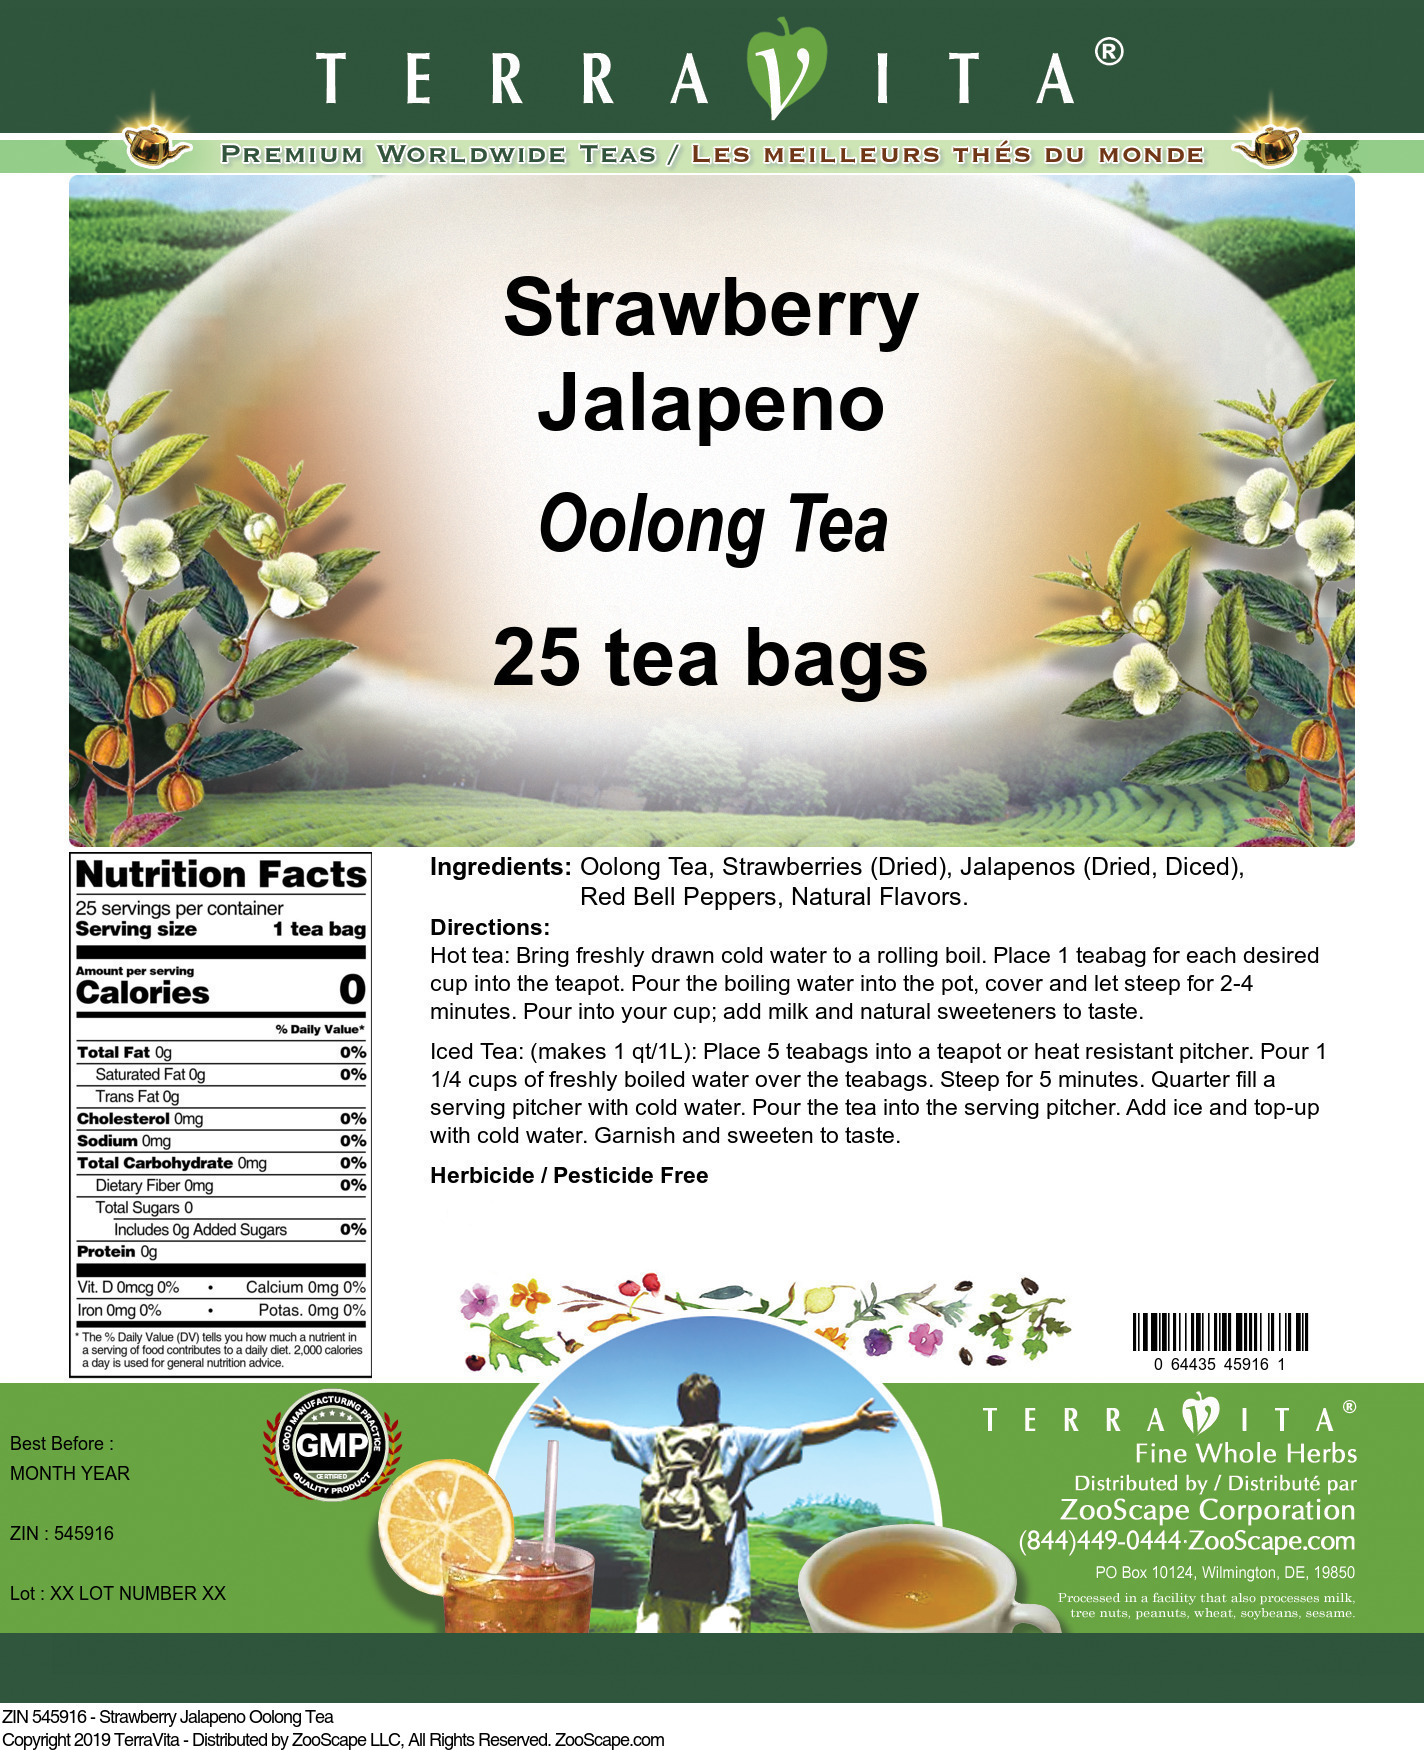 Strawberry Jalapeno Oolong Tea